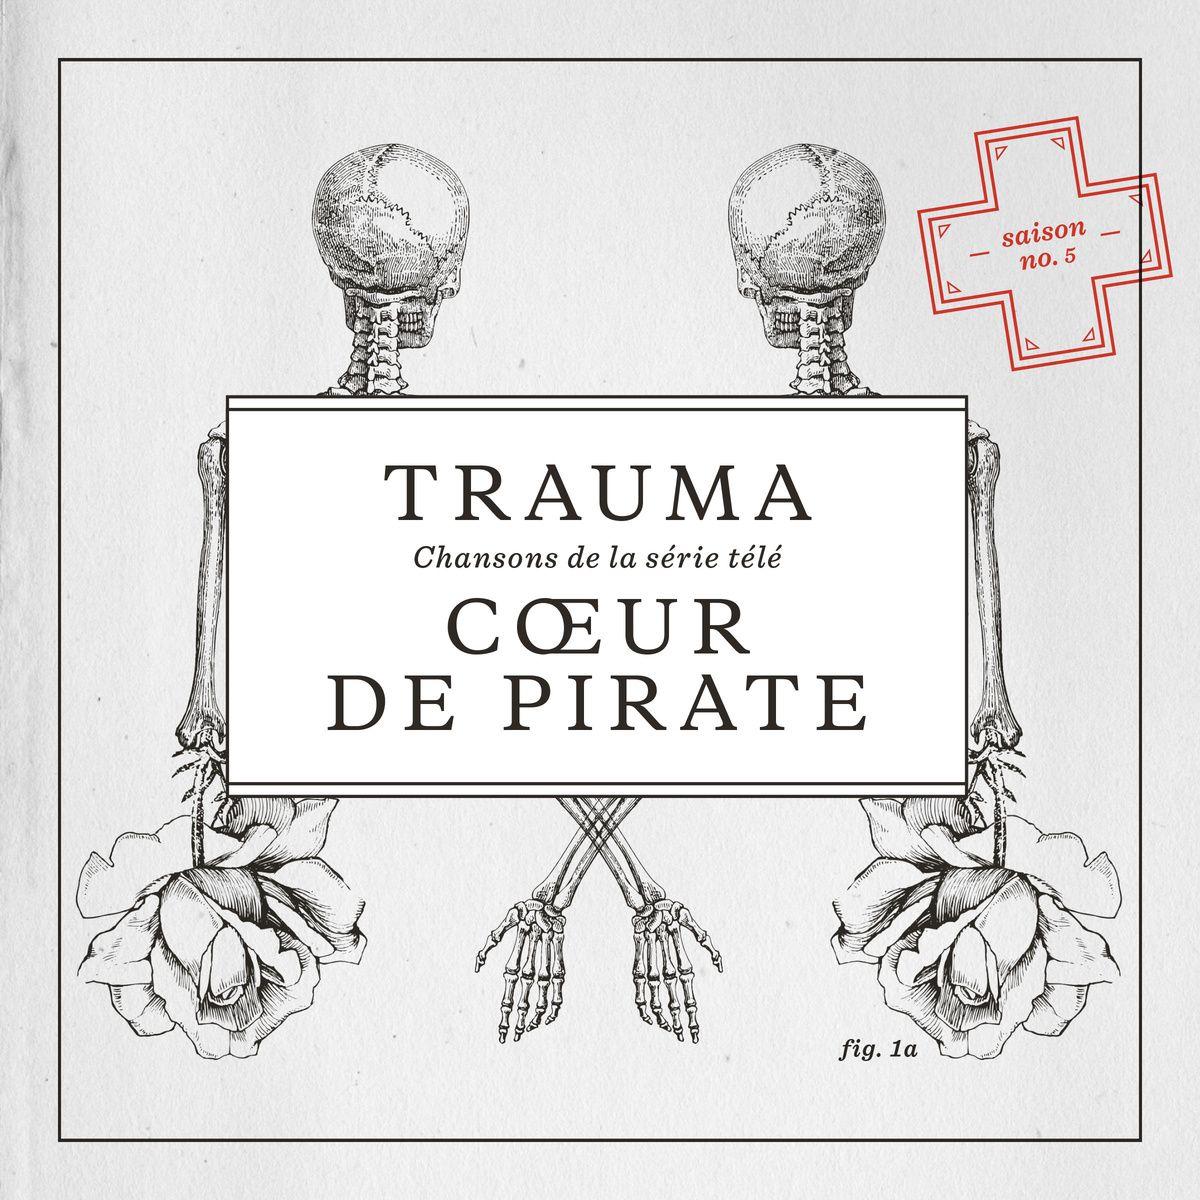 Coeur de pirate trauma soundtrack and pianos songs hexwebz Gallery